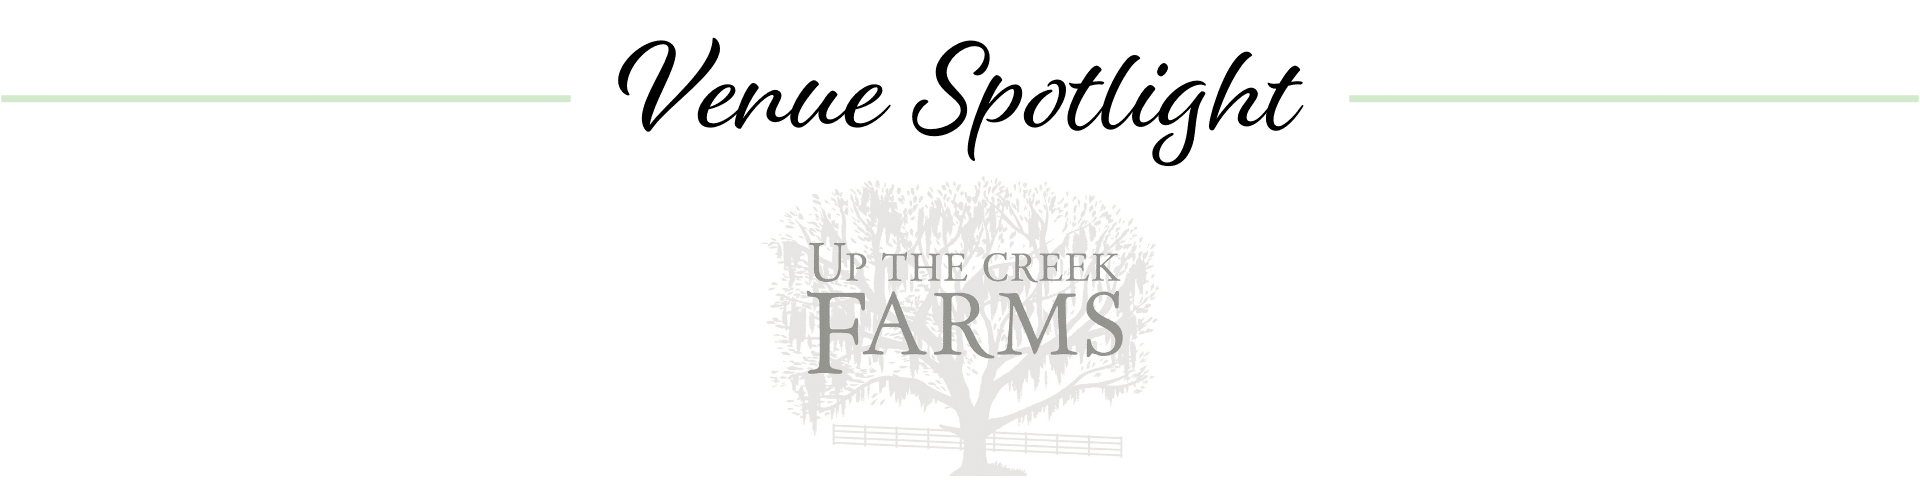 Venue Spotlight: Up the Creek Farms